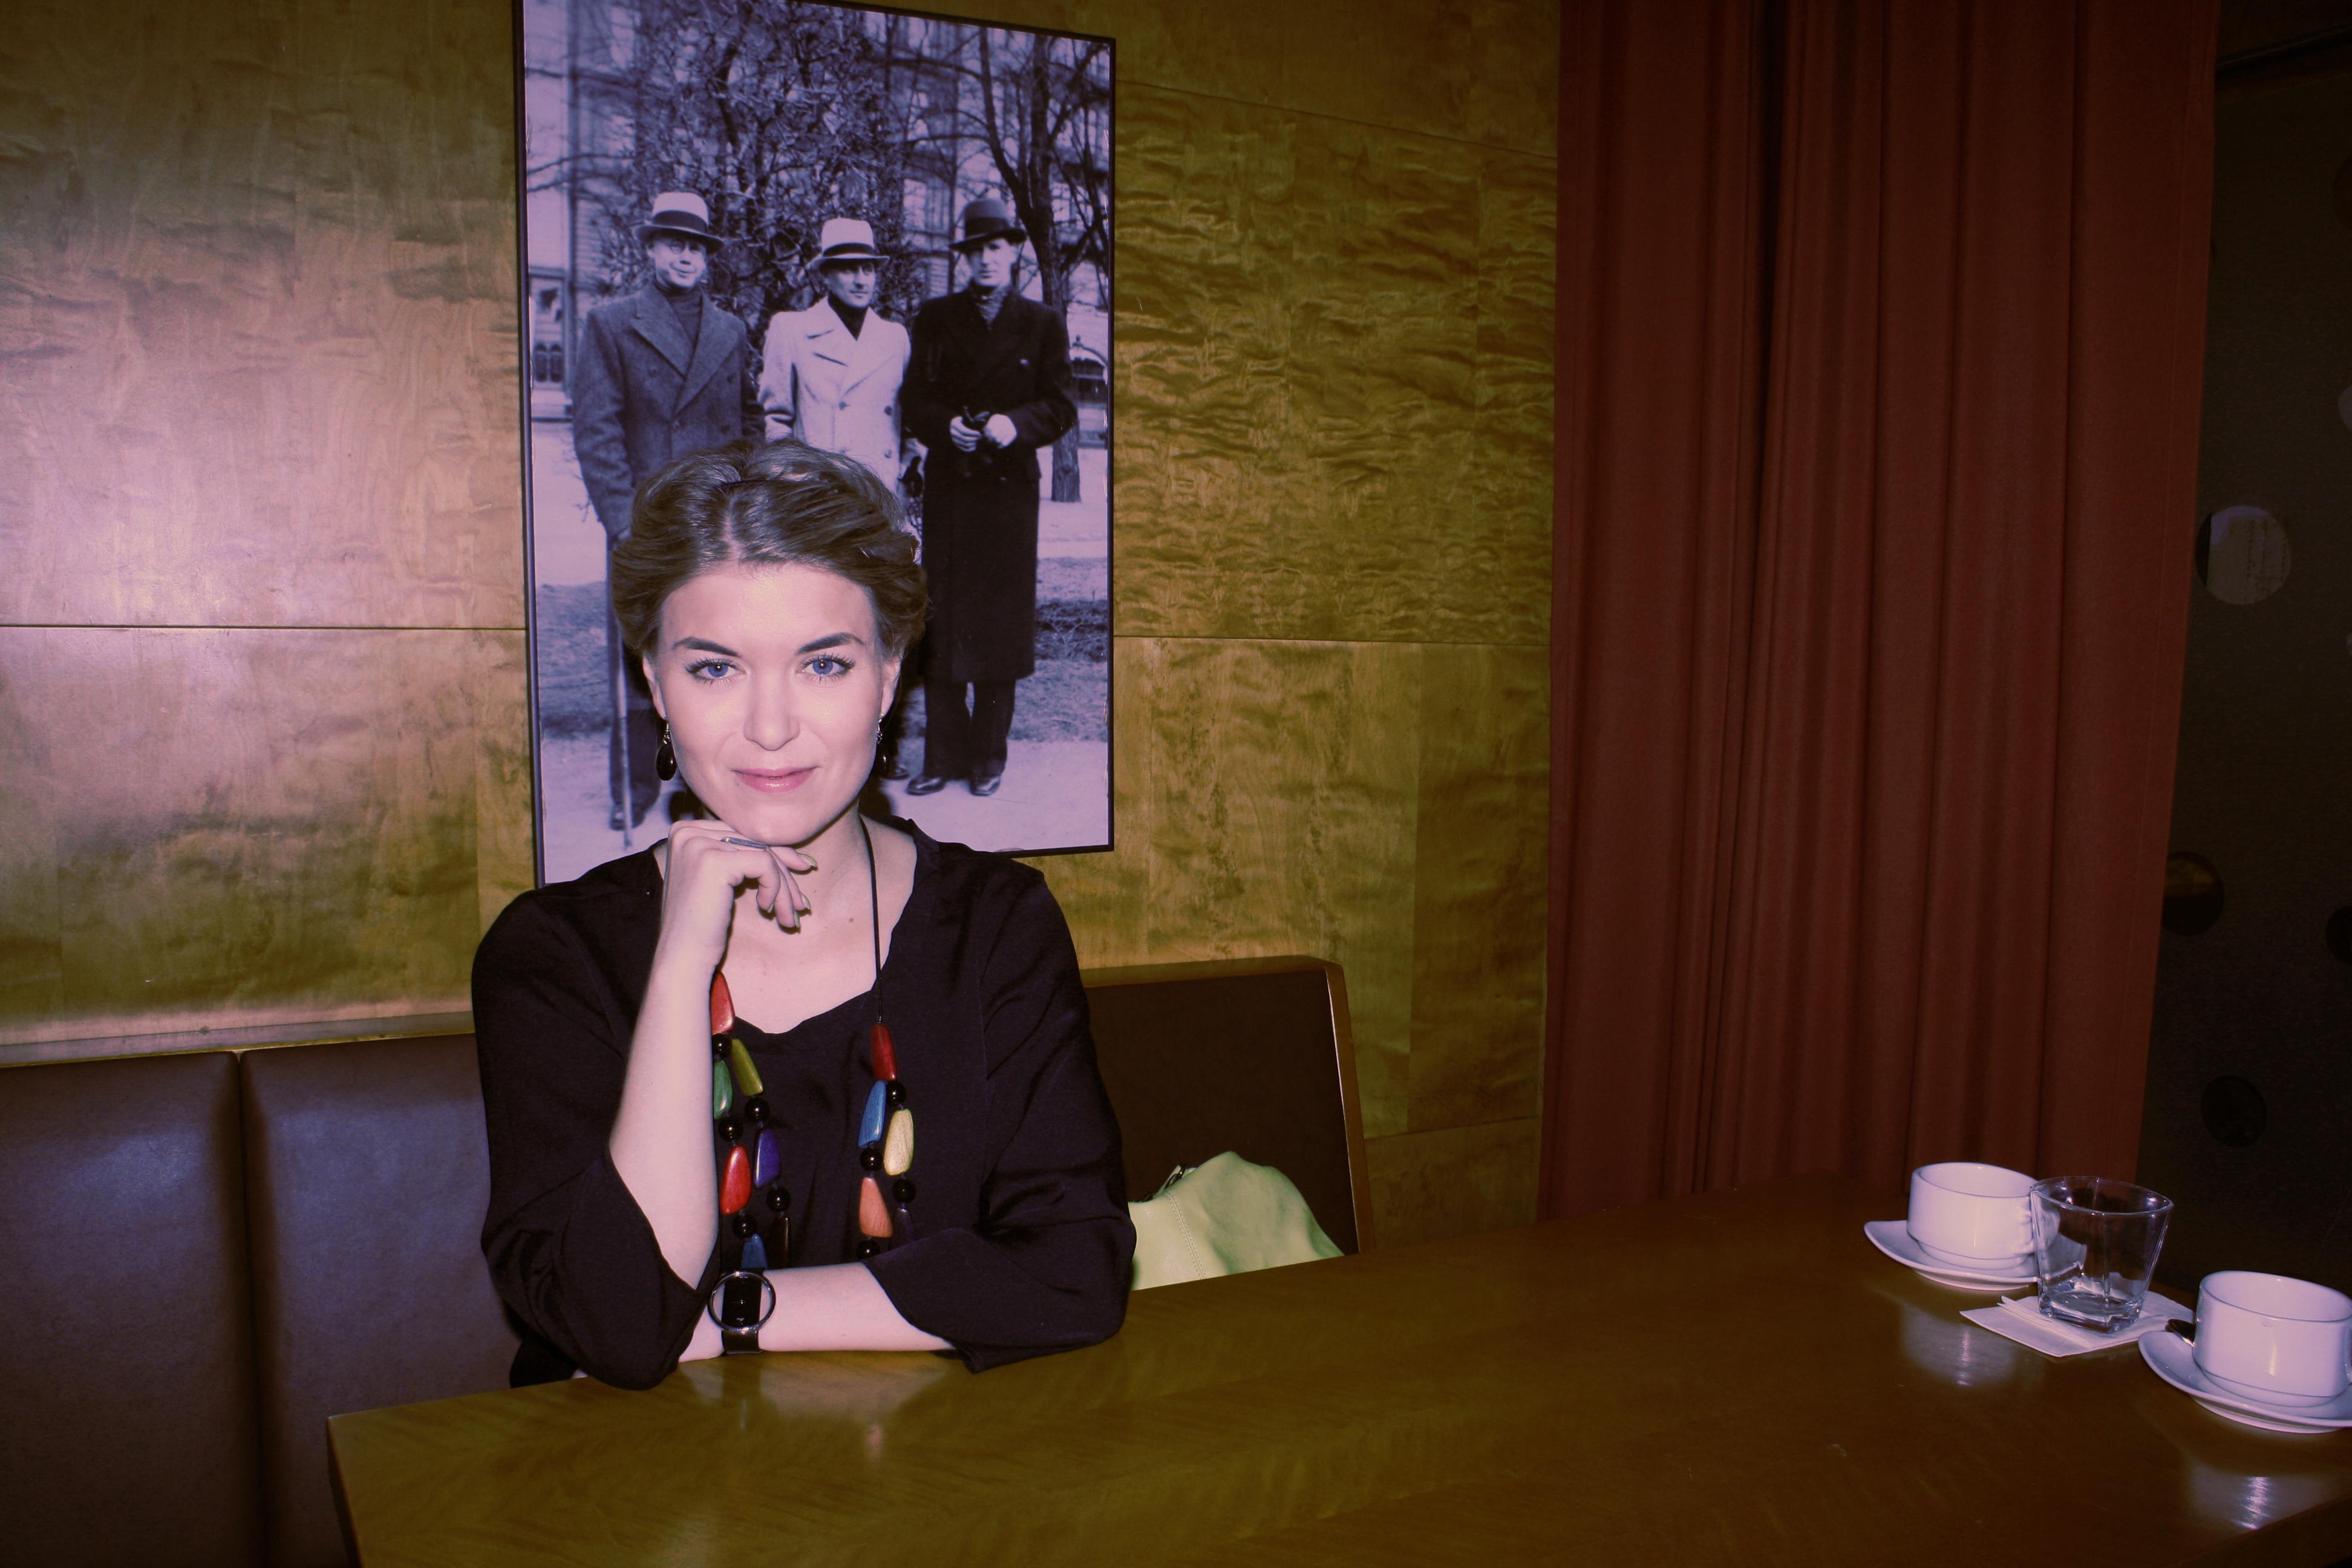 Susanna Koski Backgrounds on Wallpapers Vista